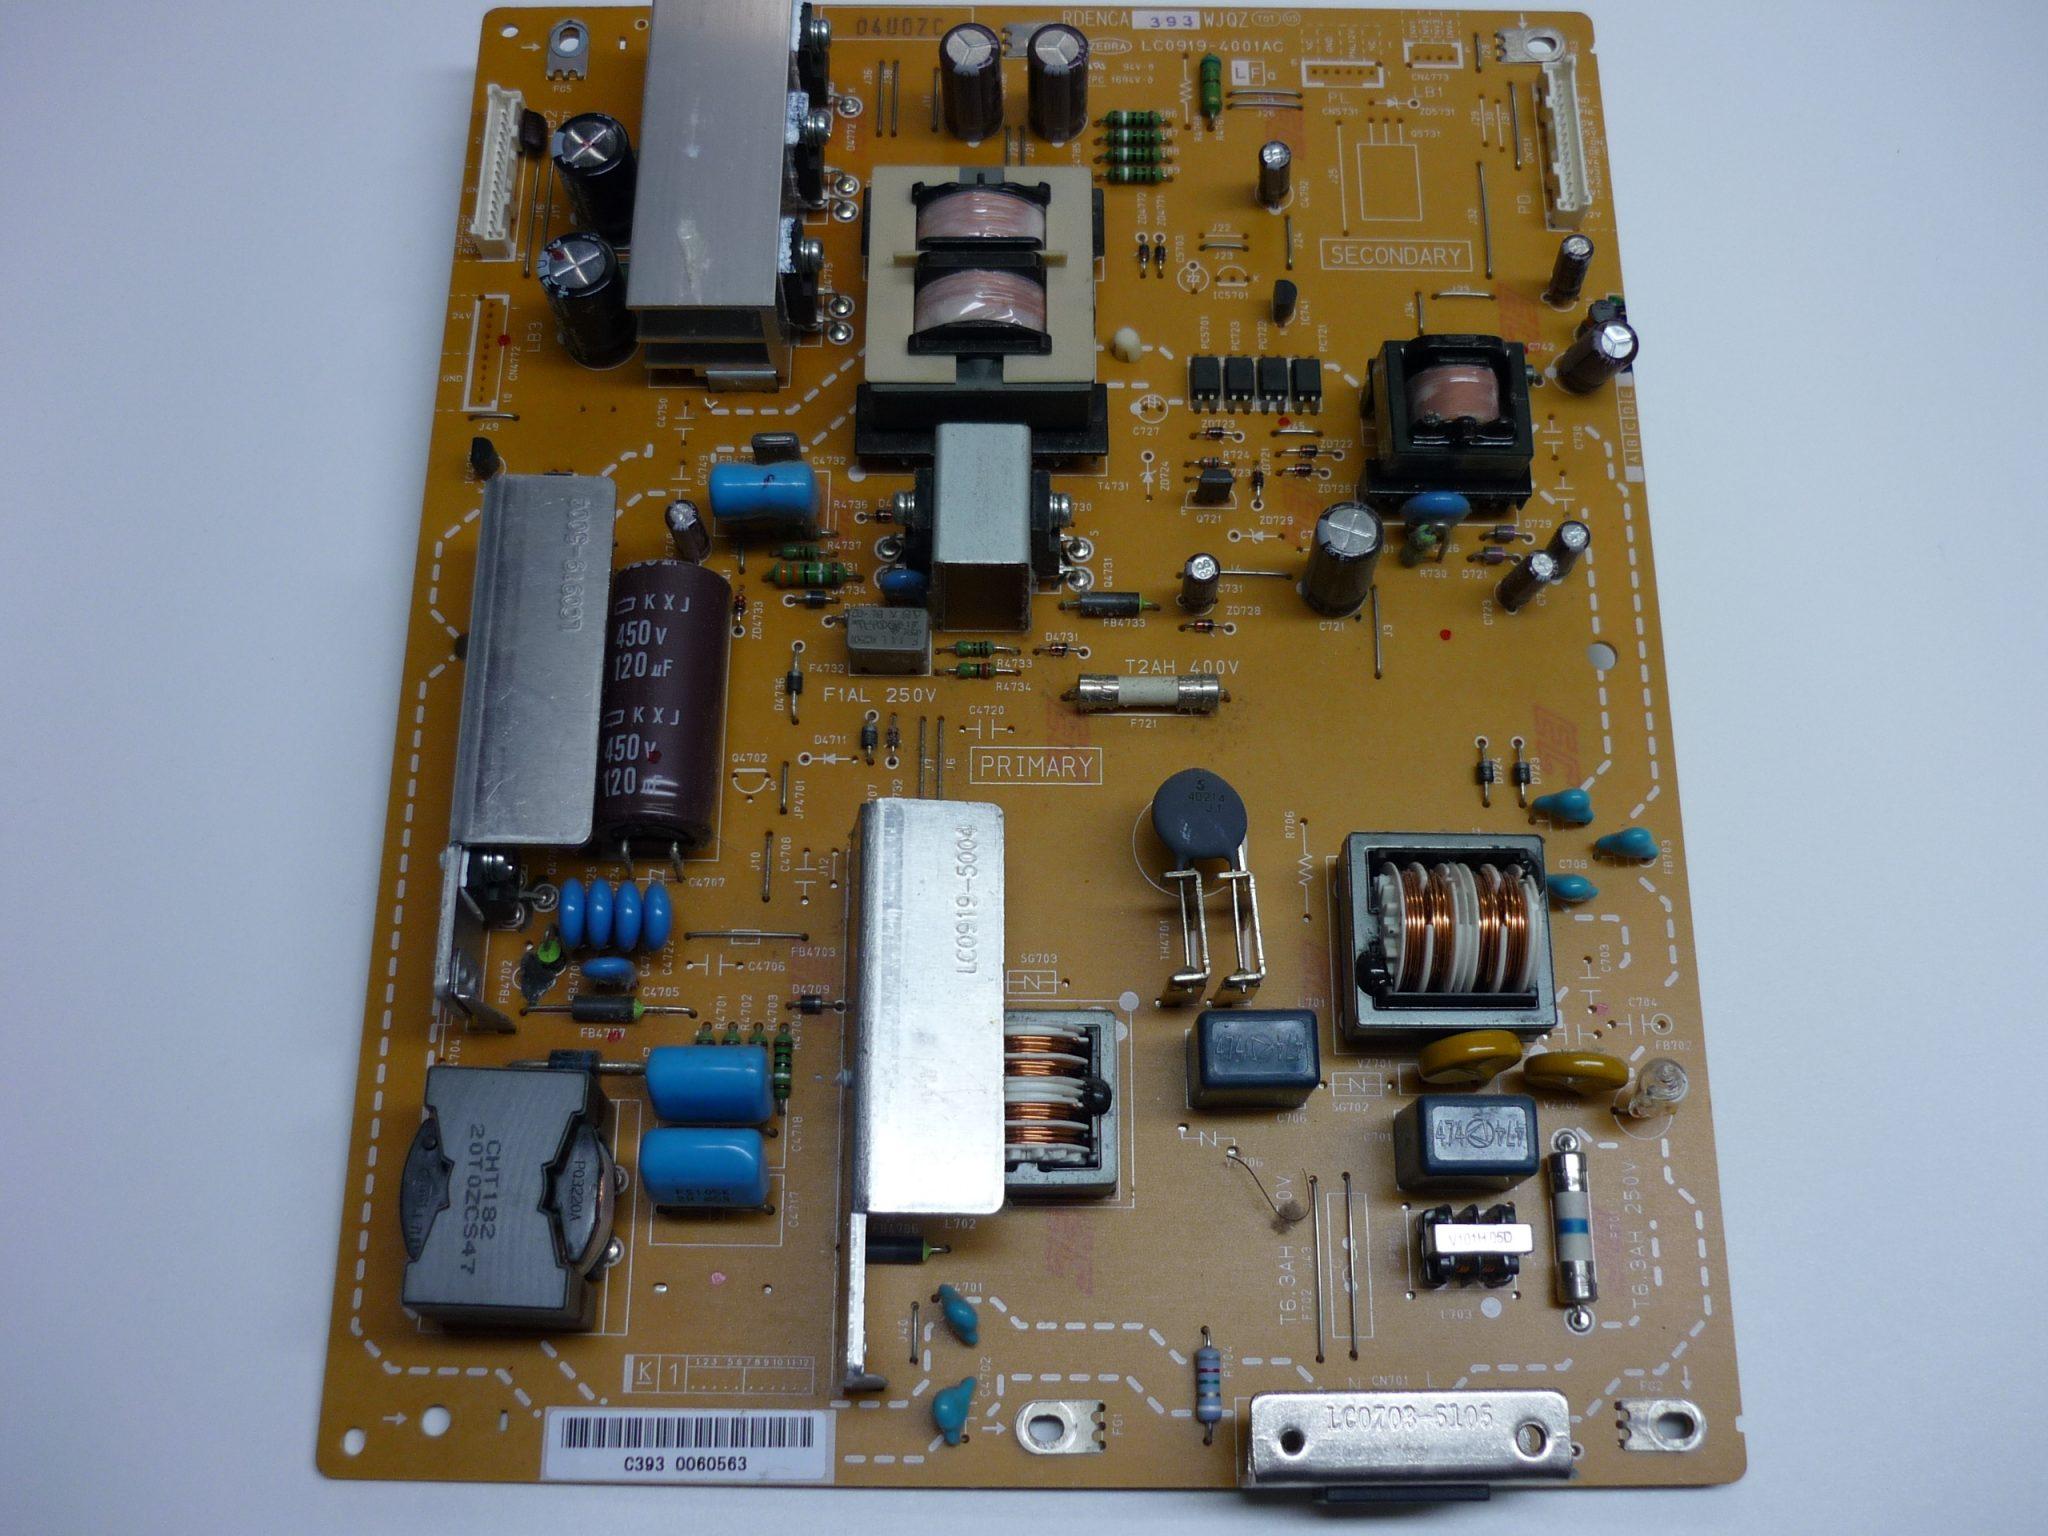 Sharp RDENCA393WJQZ (LC0919-4001AC) Power Supply Unit For LC-40D68UT